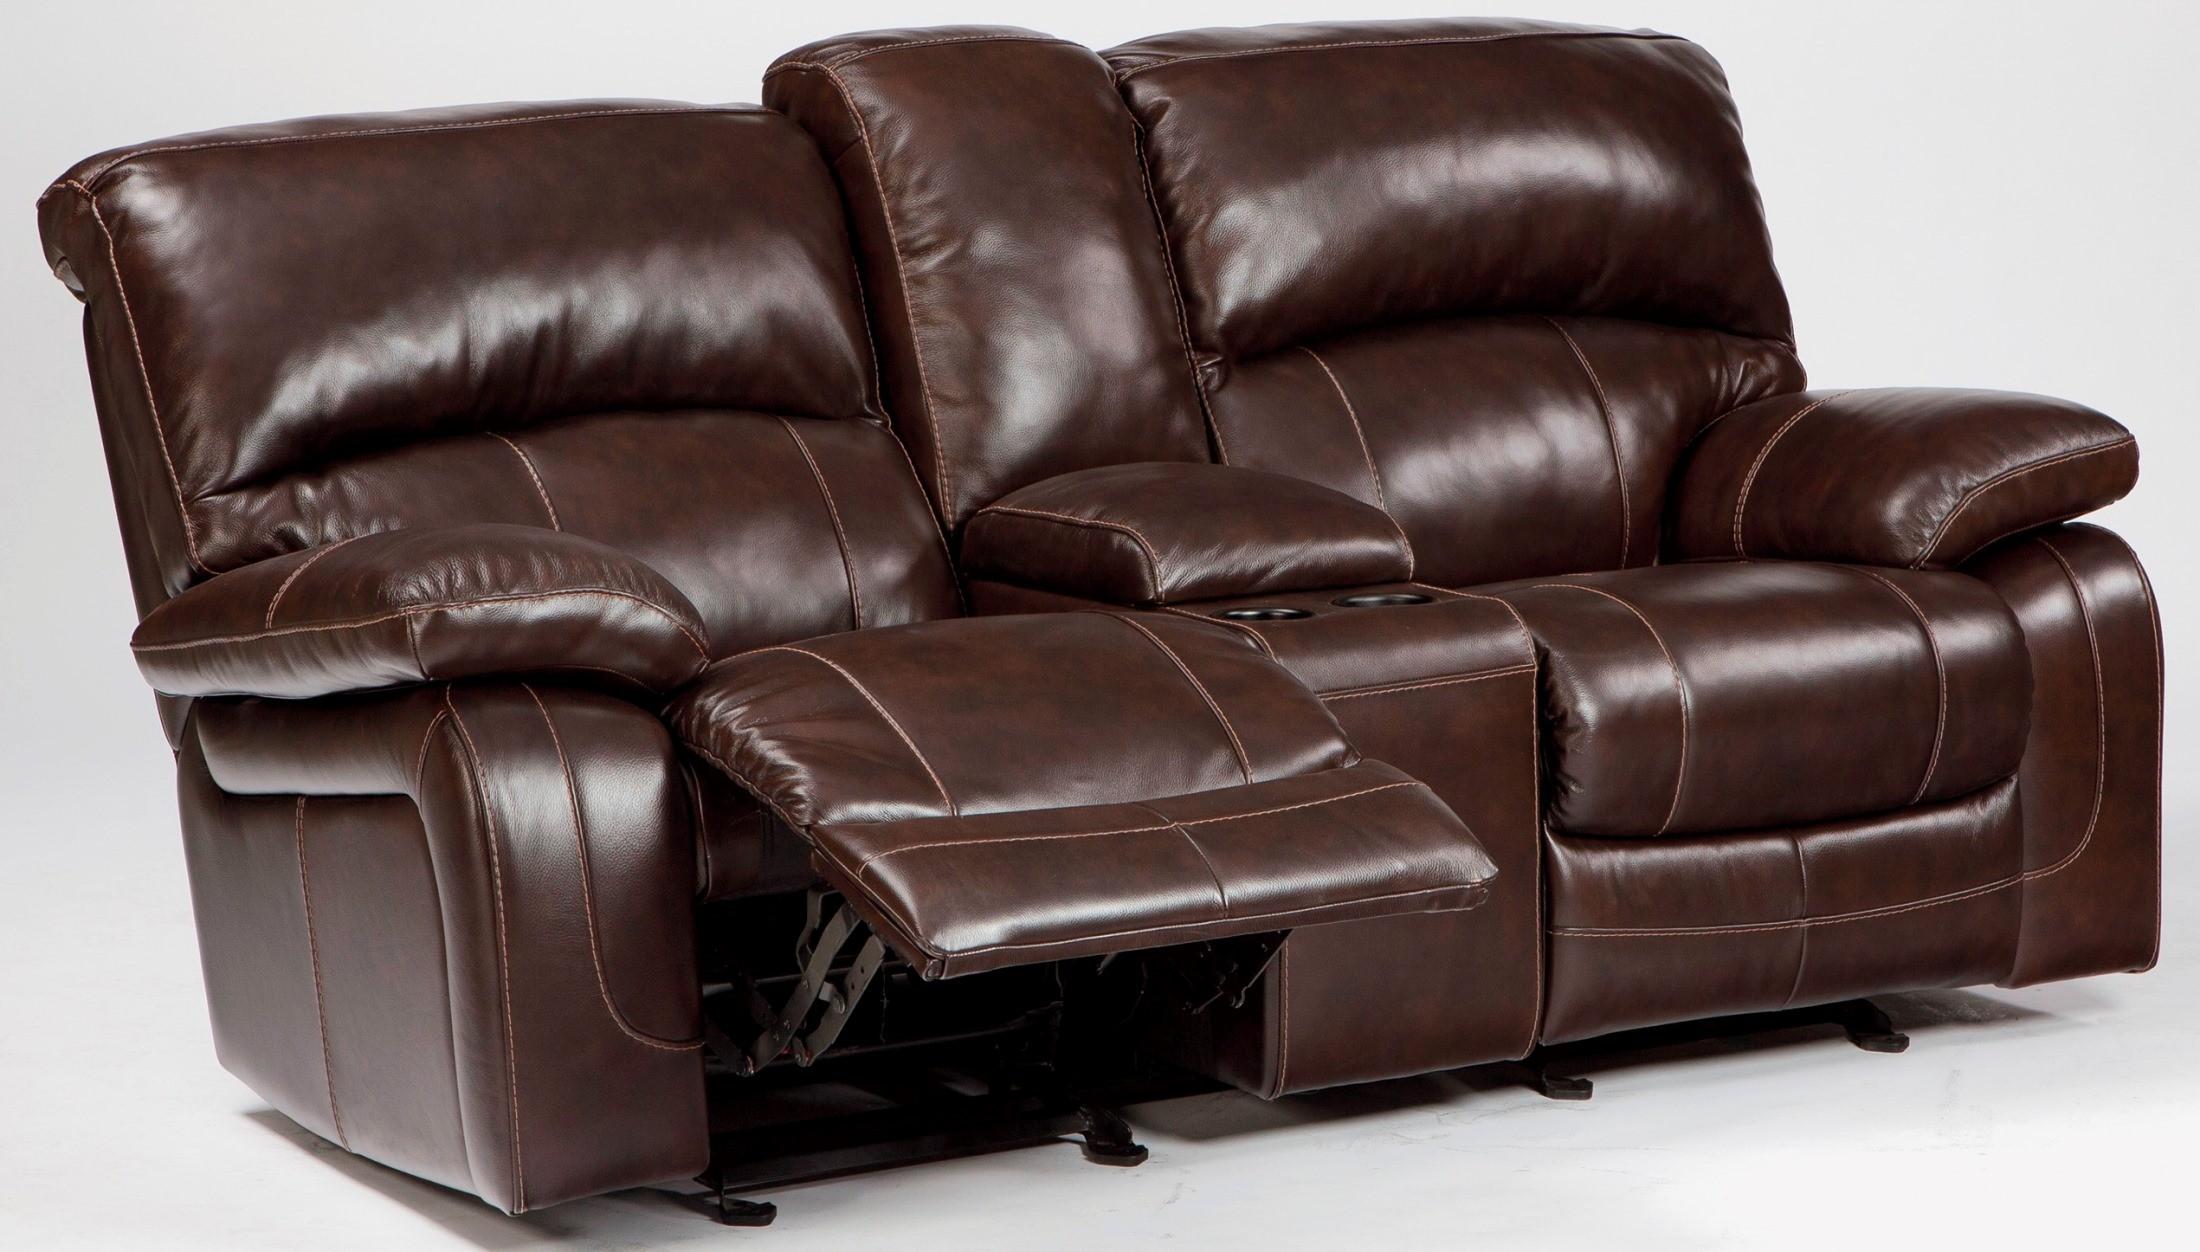 Damacio Dark Brown Glider Reclining Loveseat With Console From Ashley U9820043 Coleman Furniture